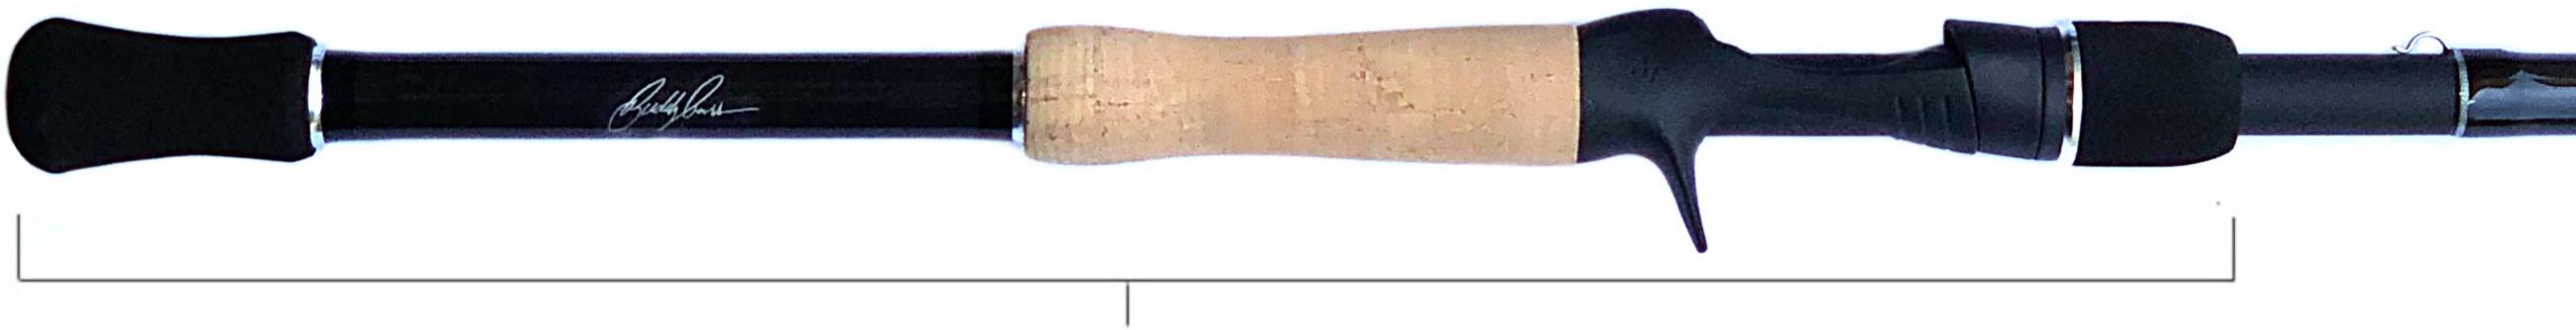 710-bg-handle.jpg